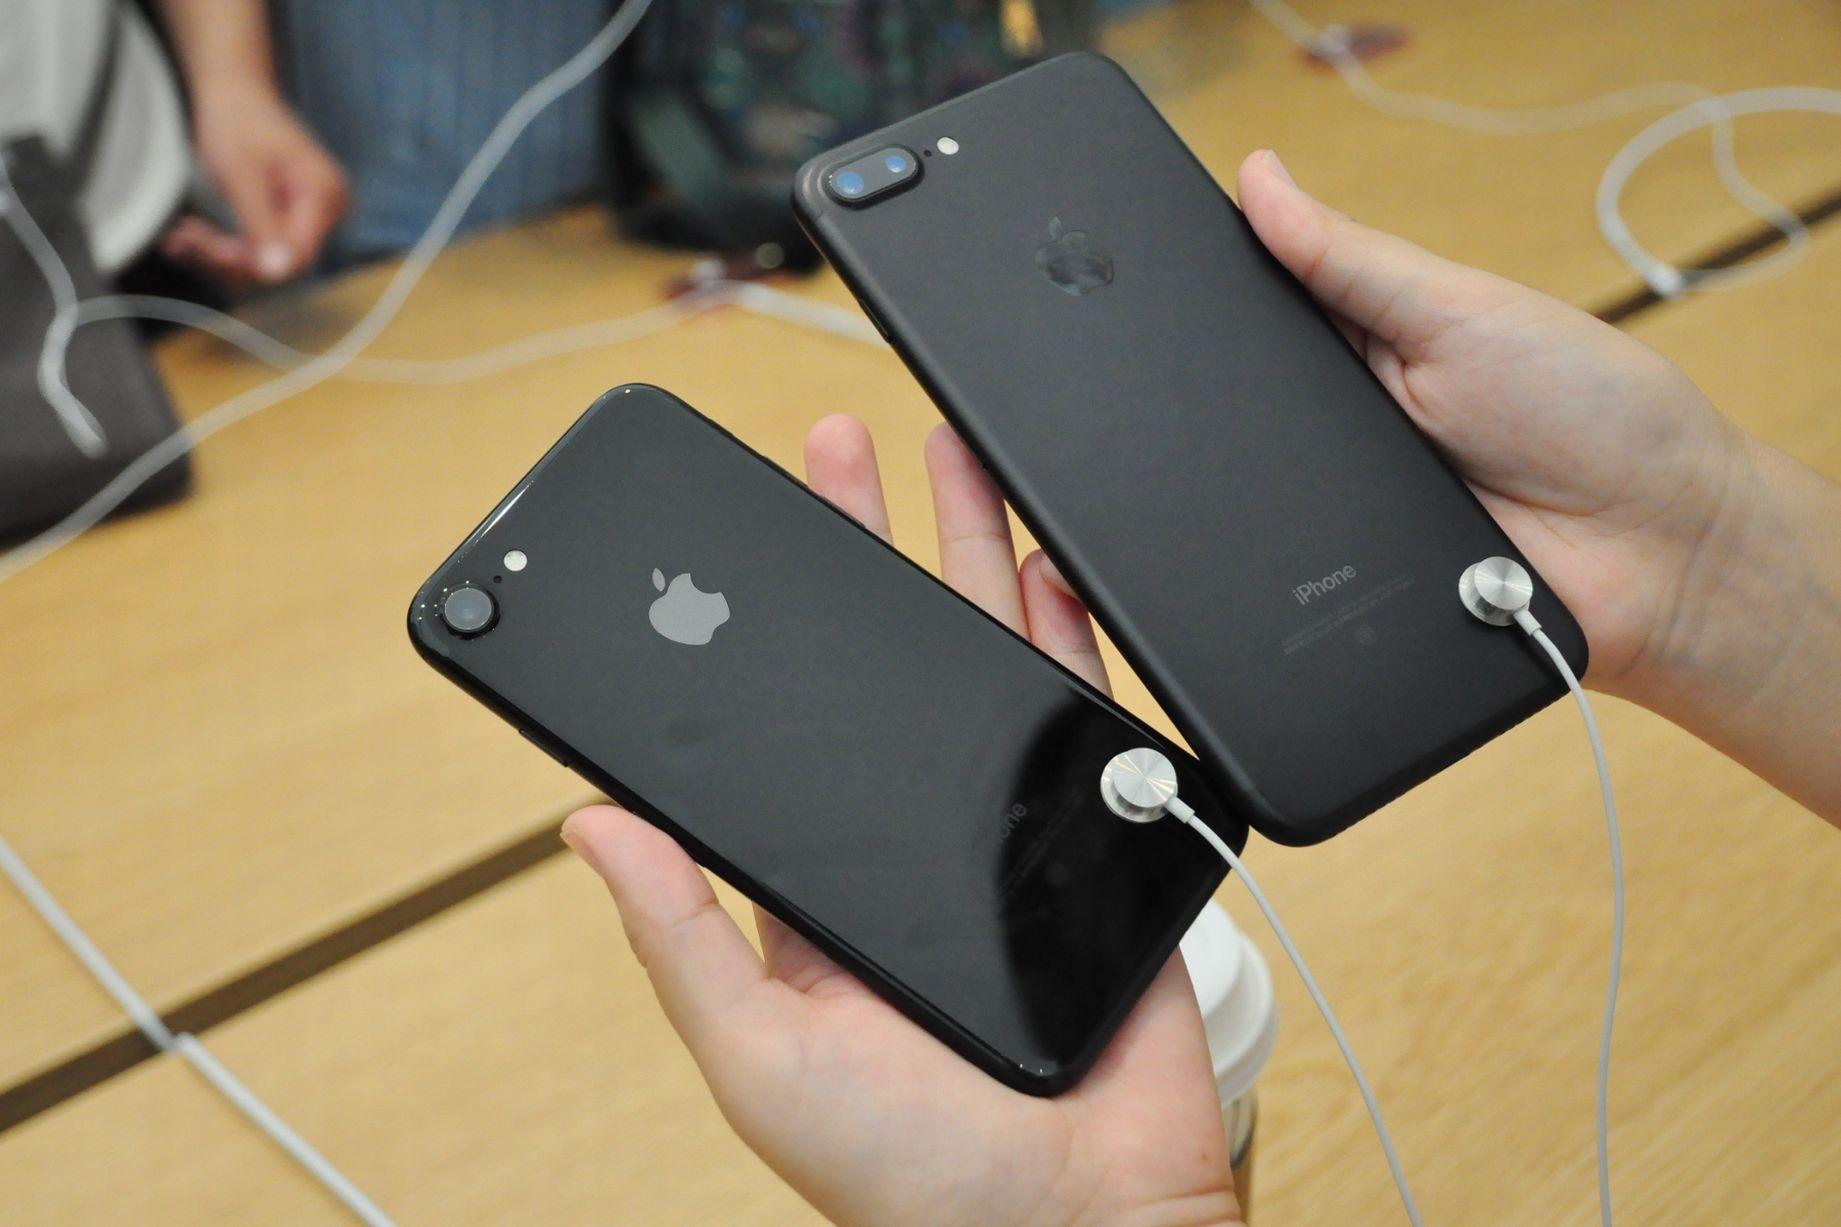 iPhone 7 and iPhone 7 Plus Price